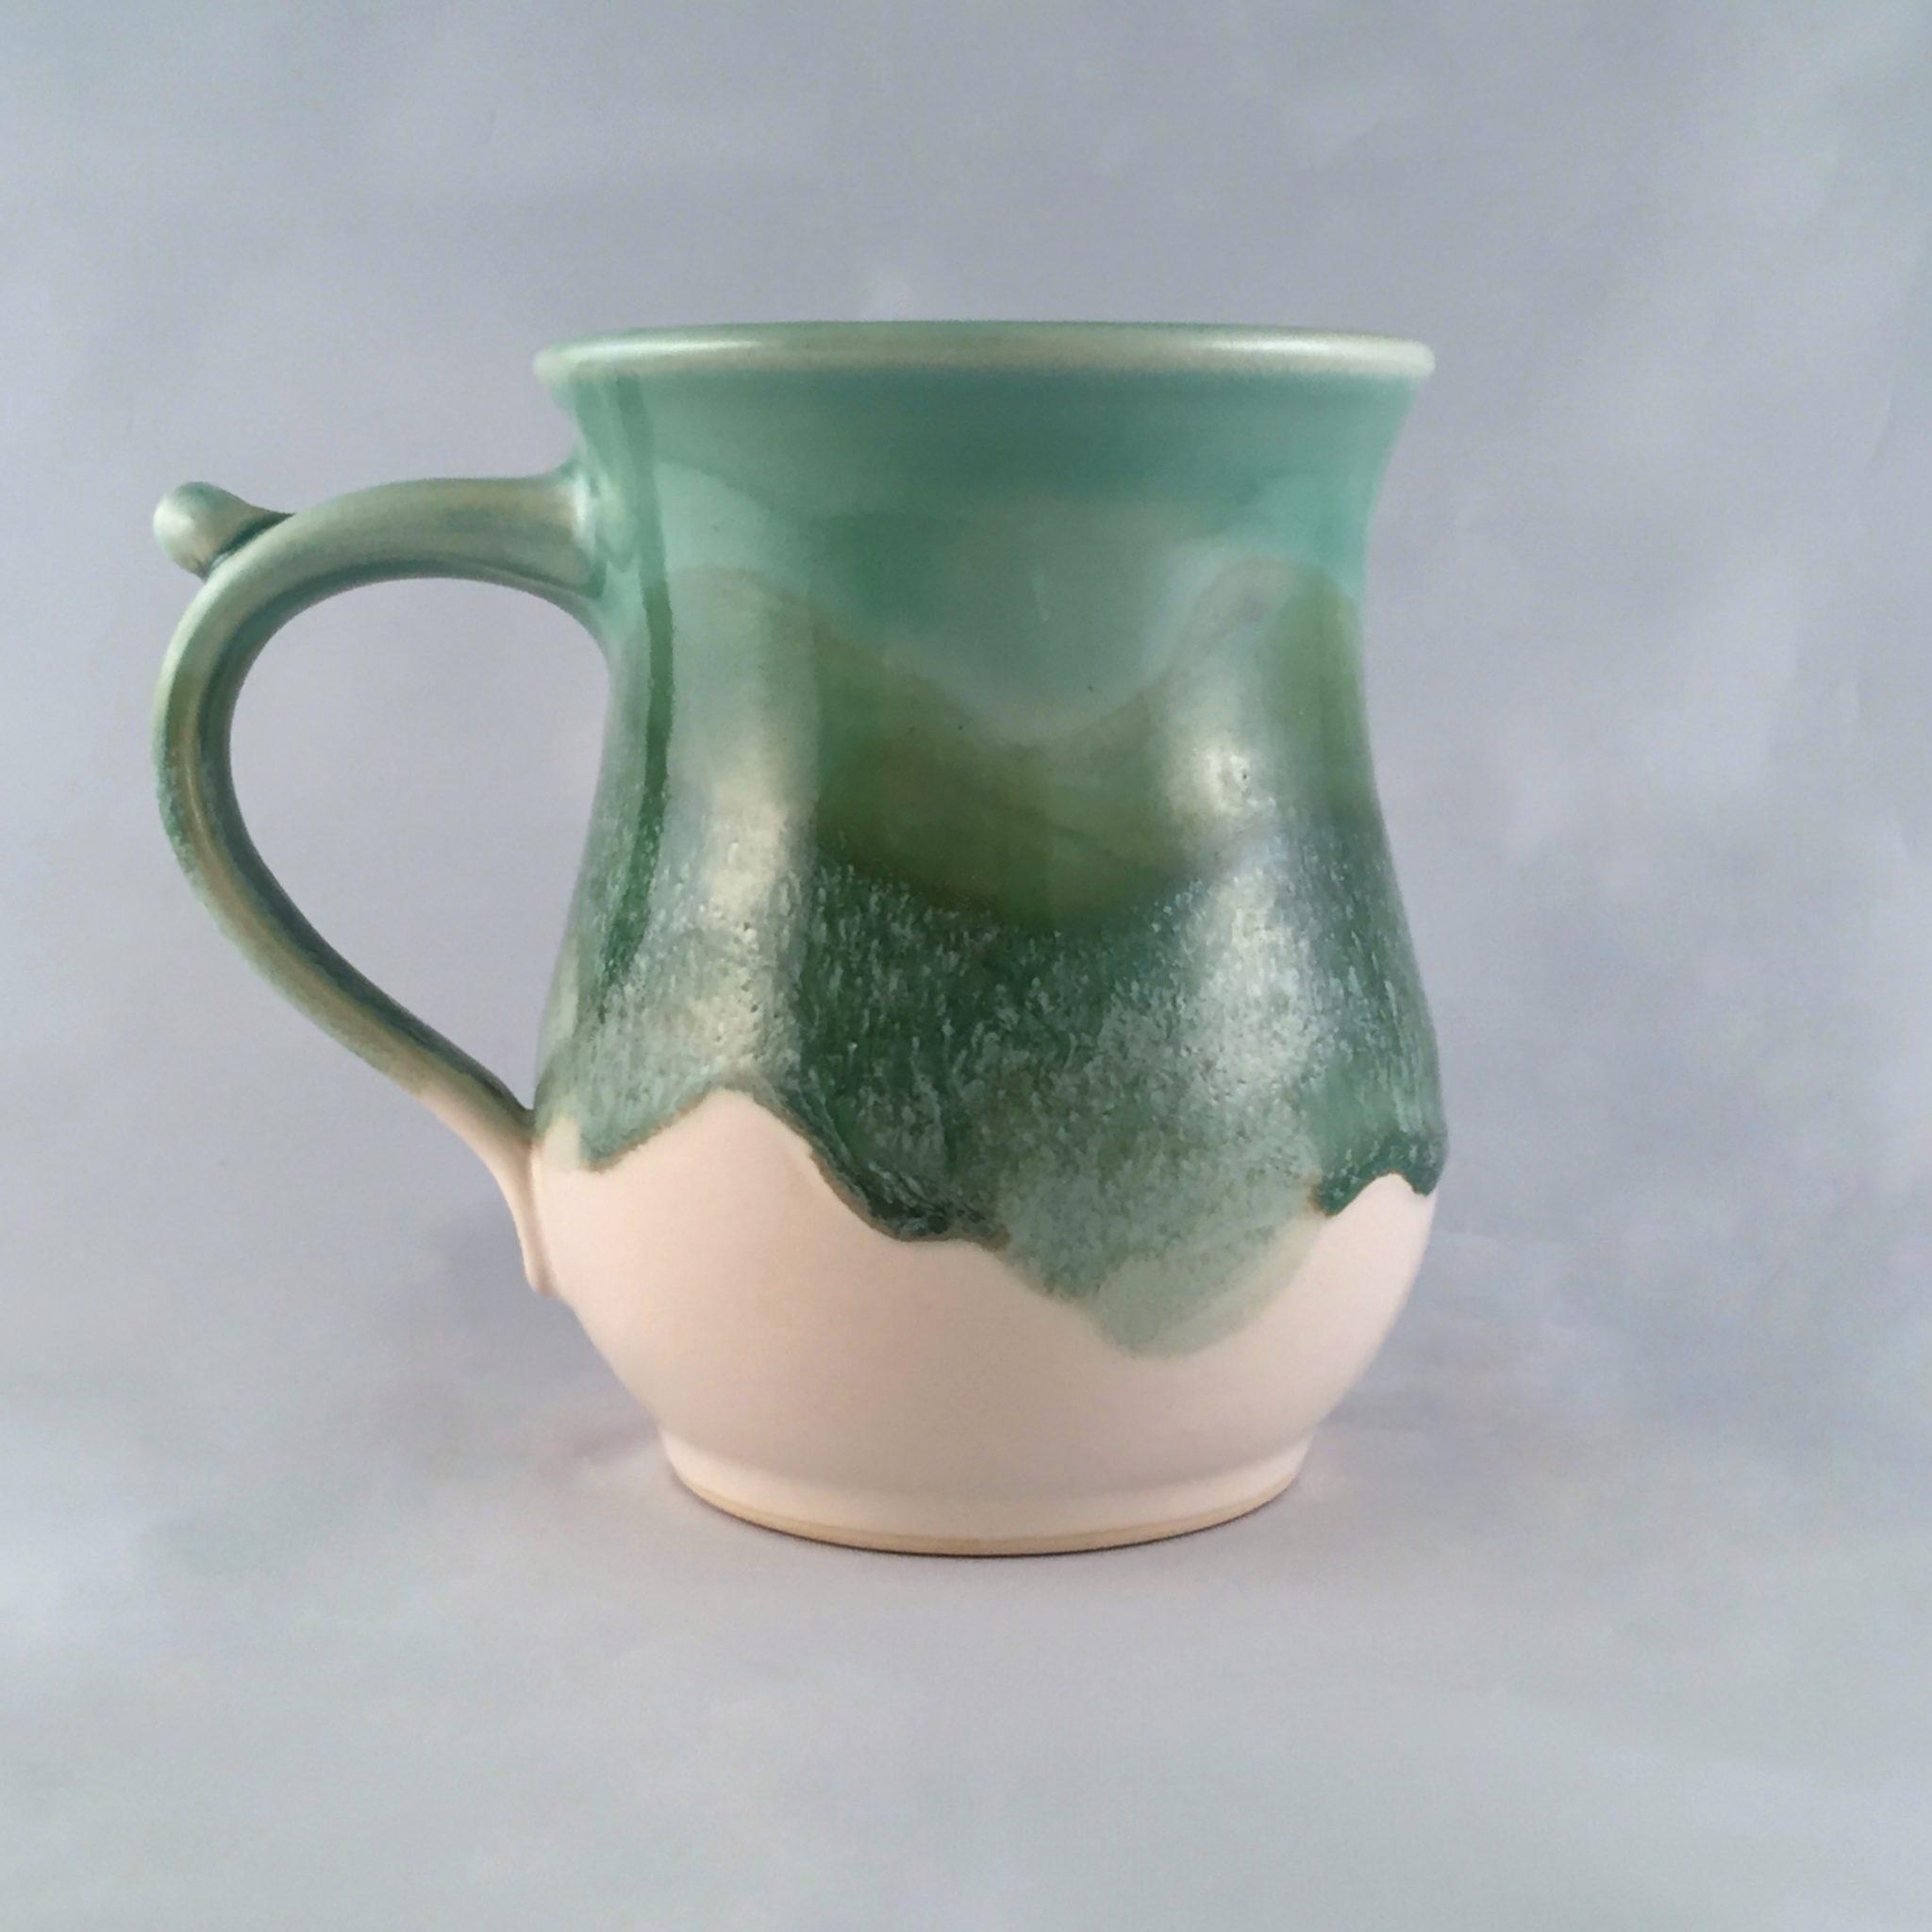 a seagreen mug